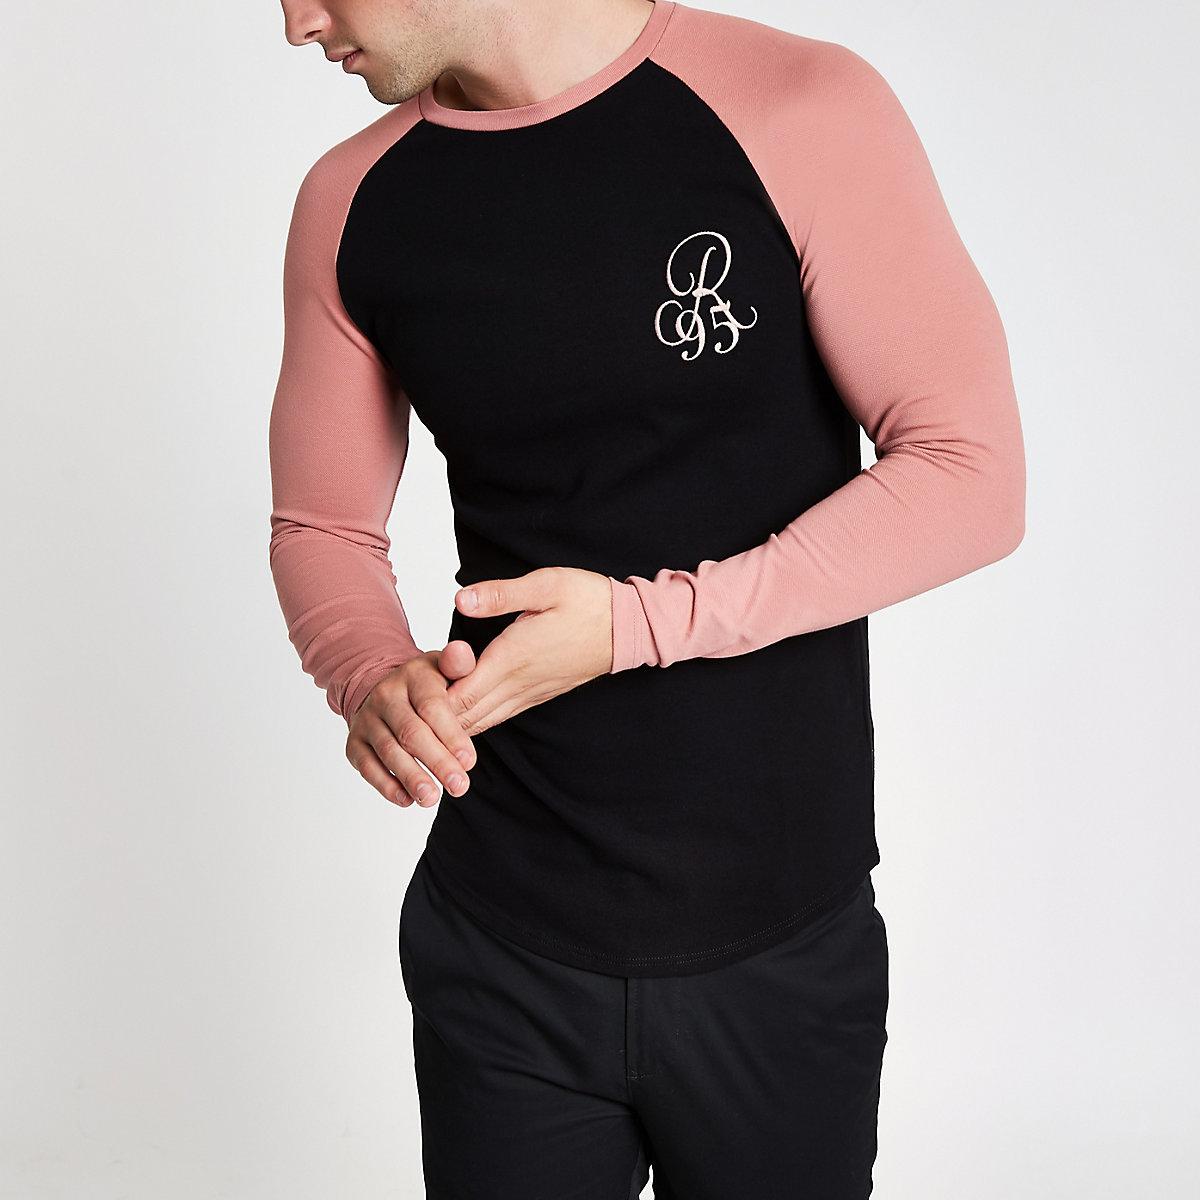 Black pique muscle fit raglan T-shirt